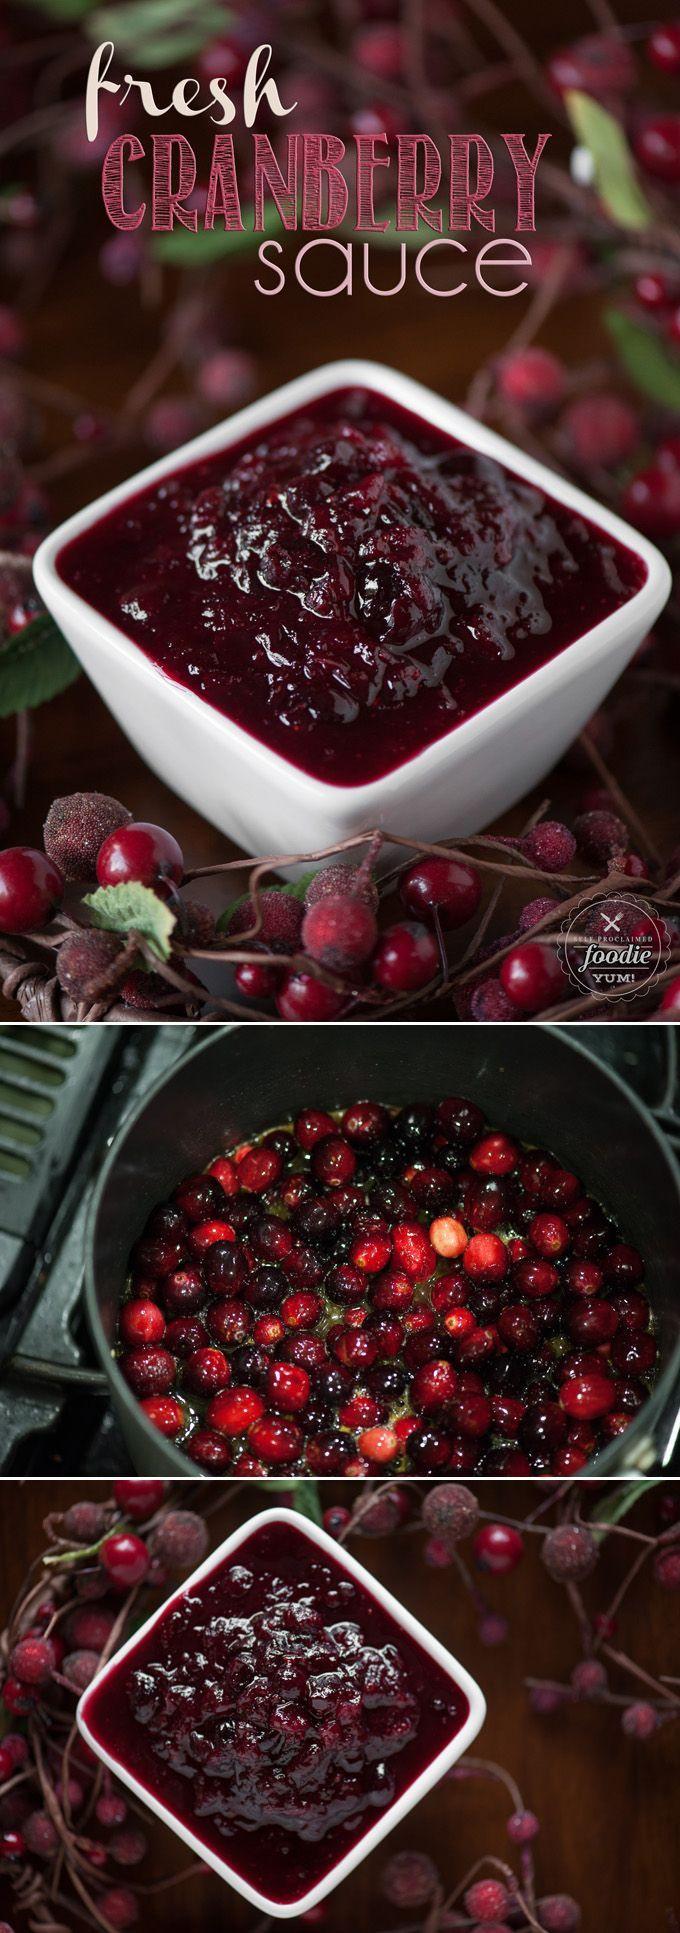 Thanksgiving Cranberry Recipes  17 Best ideas about Cranberry Sauce on Pinterest